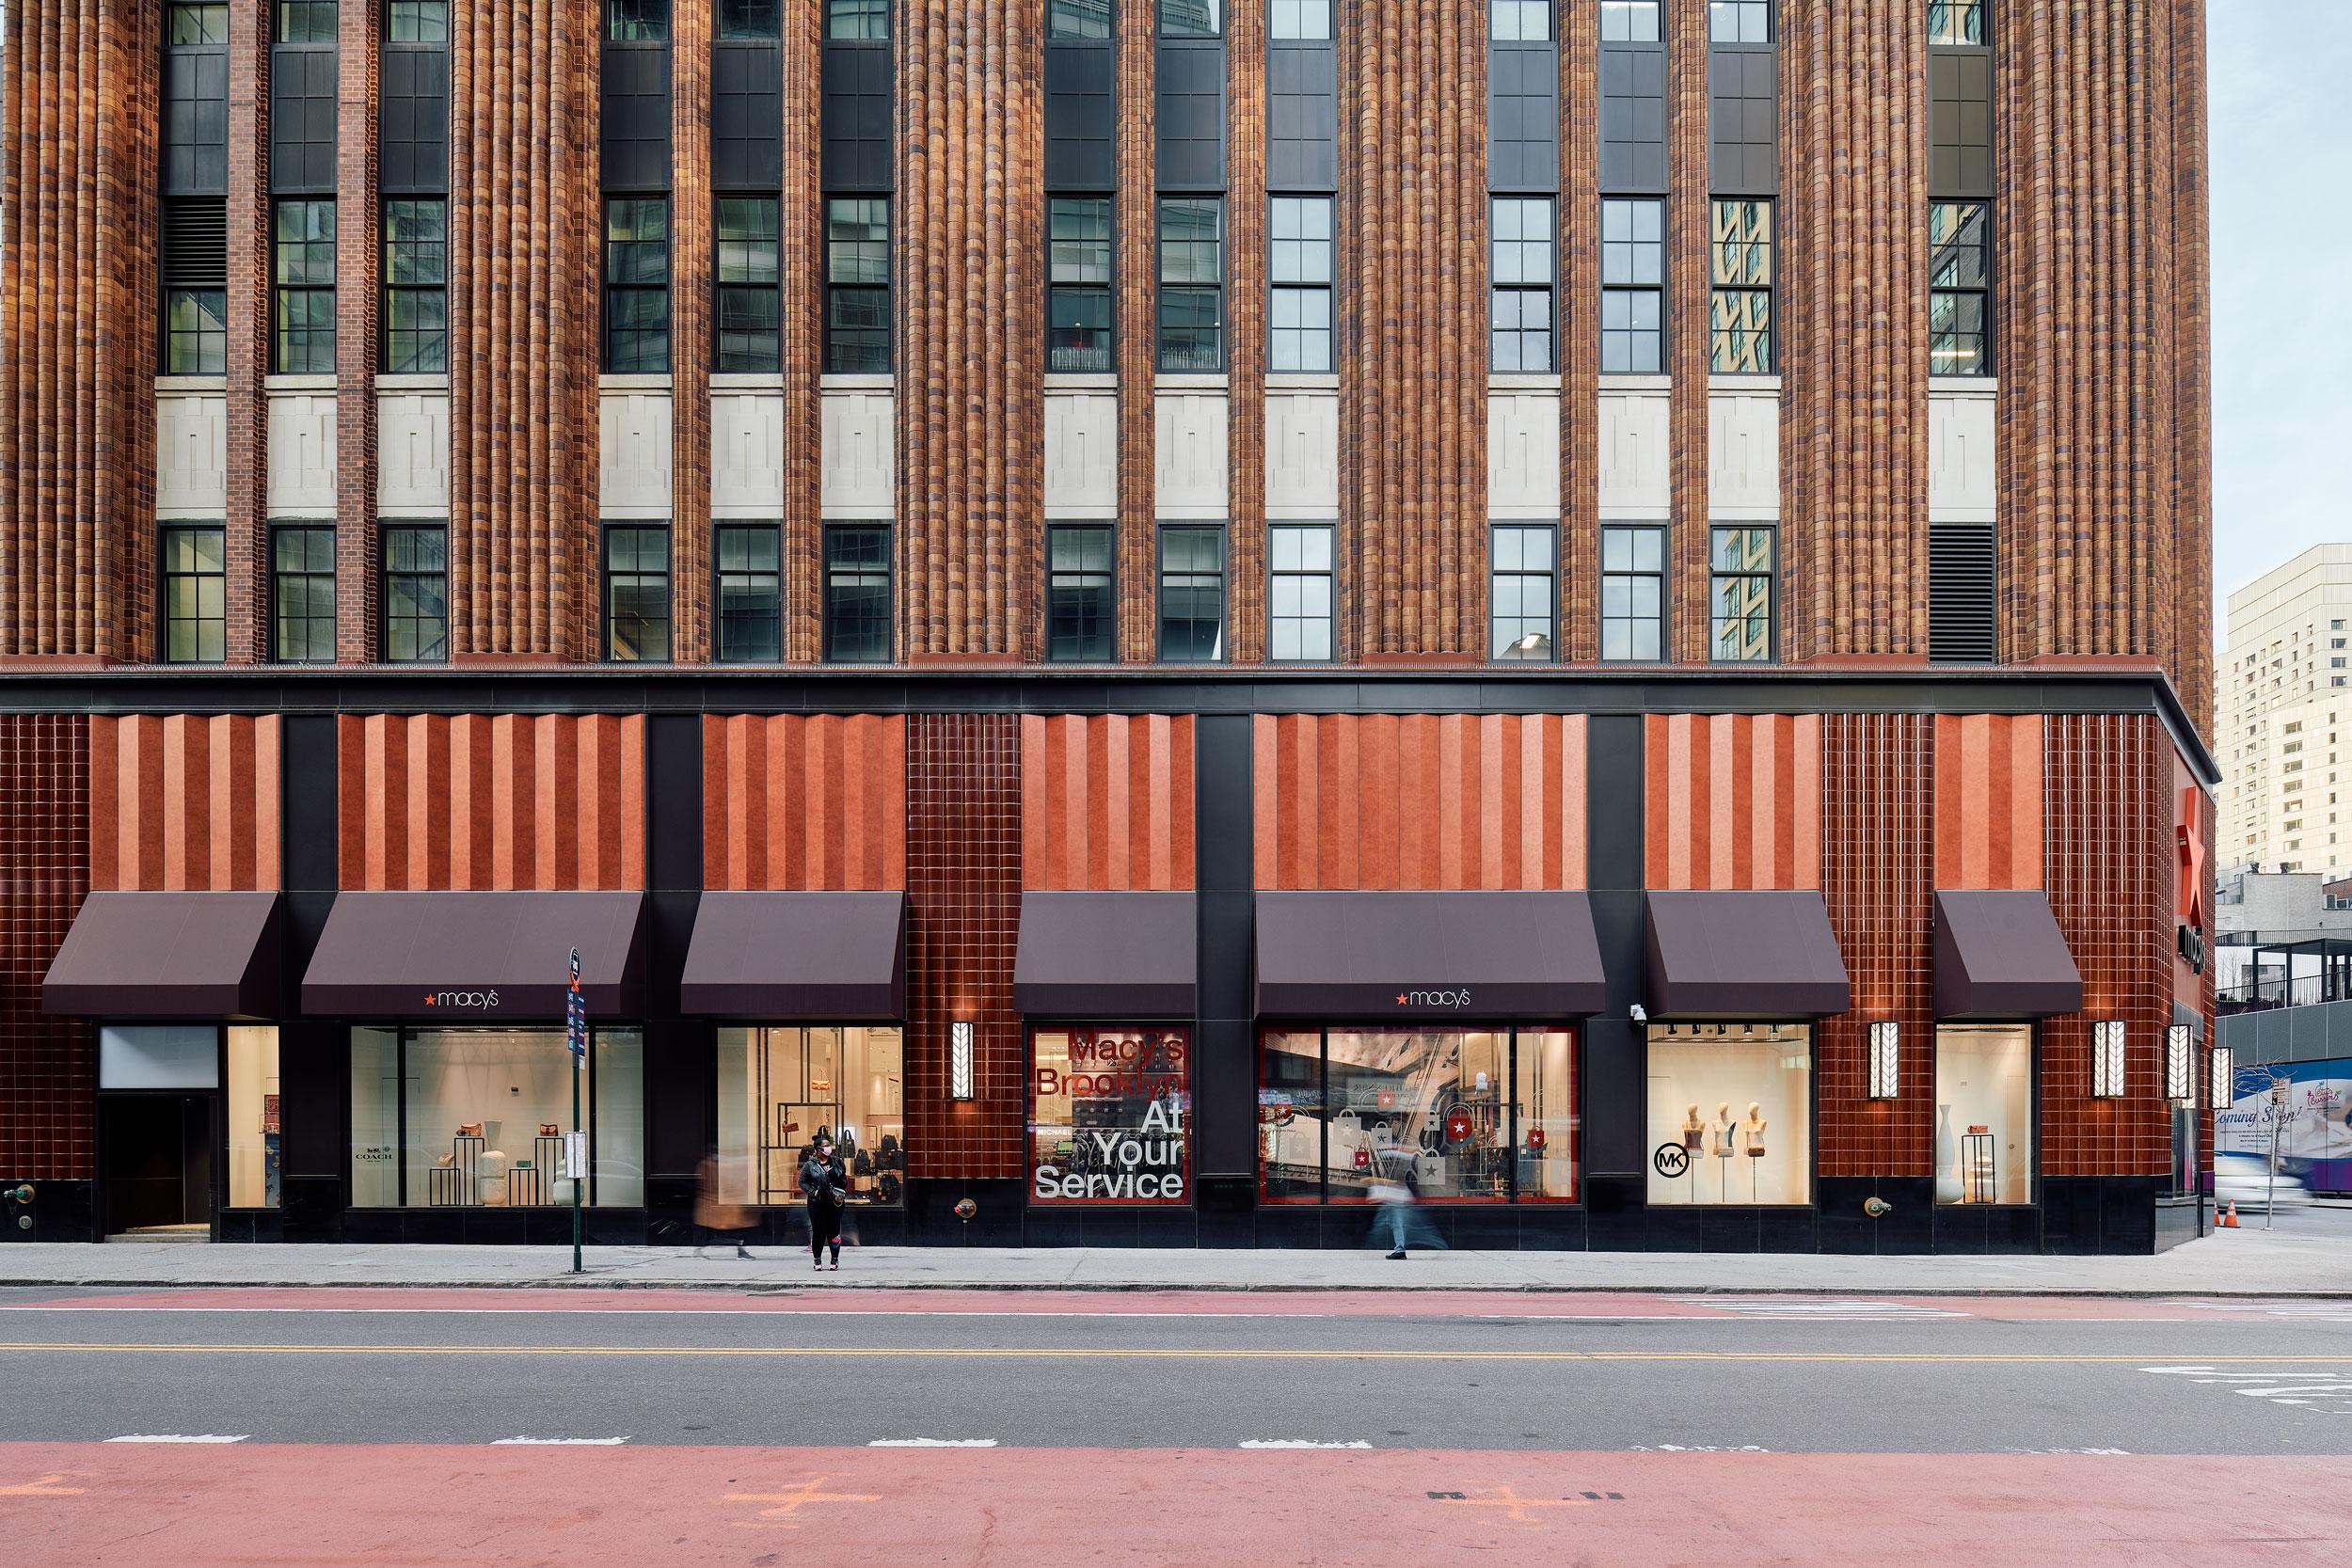 Brooklyn Historic Macys, Shimoda Design Group, New York, Pure Freeform, Lumiflon USA, REED Photographic